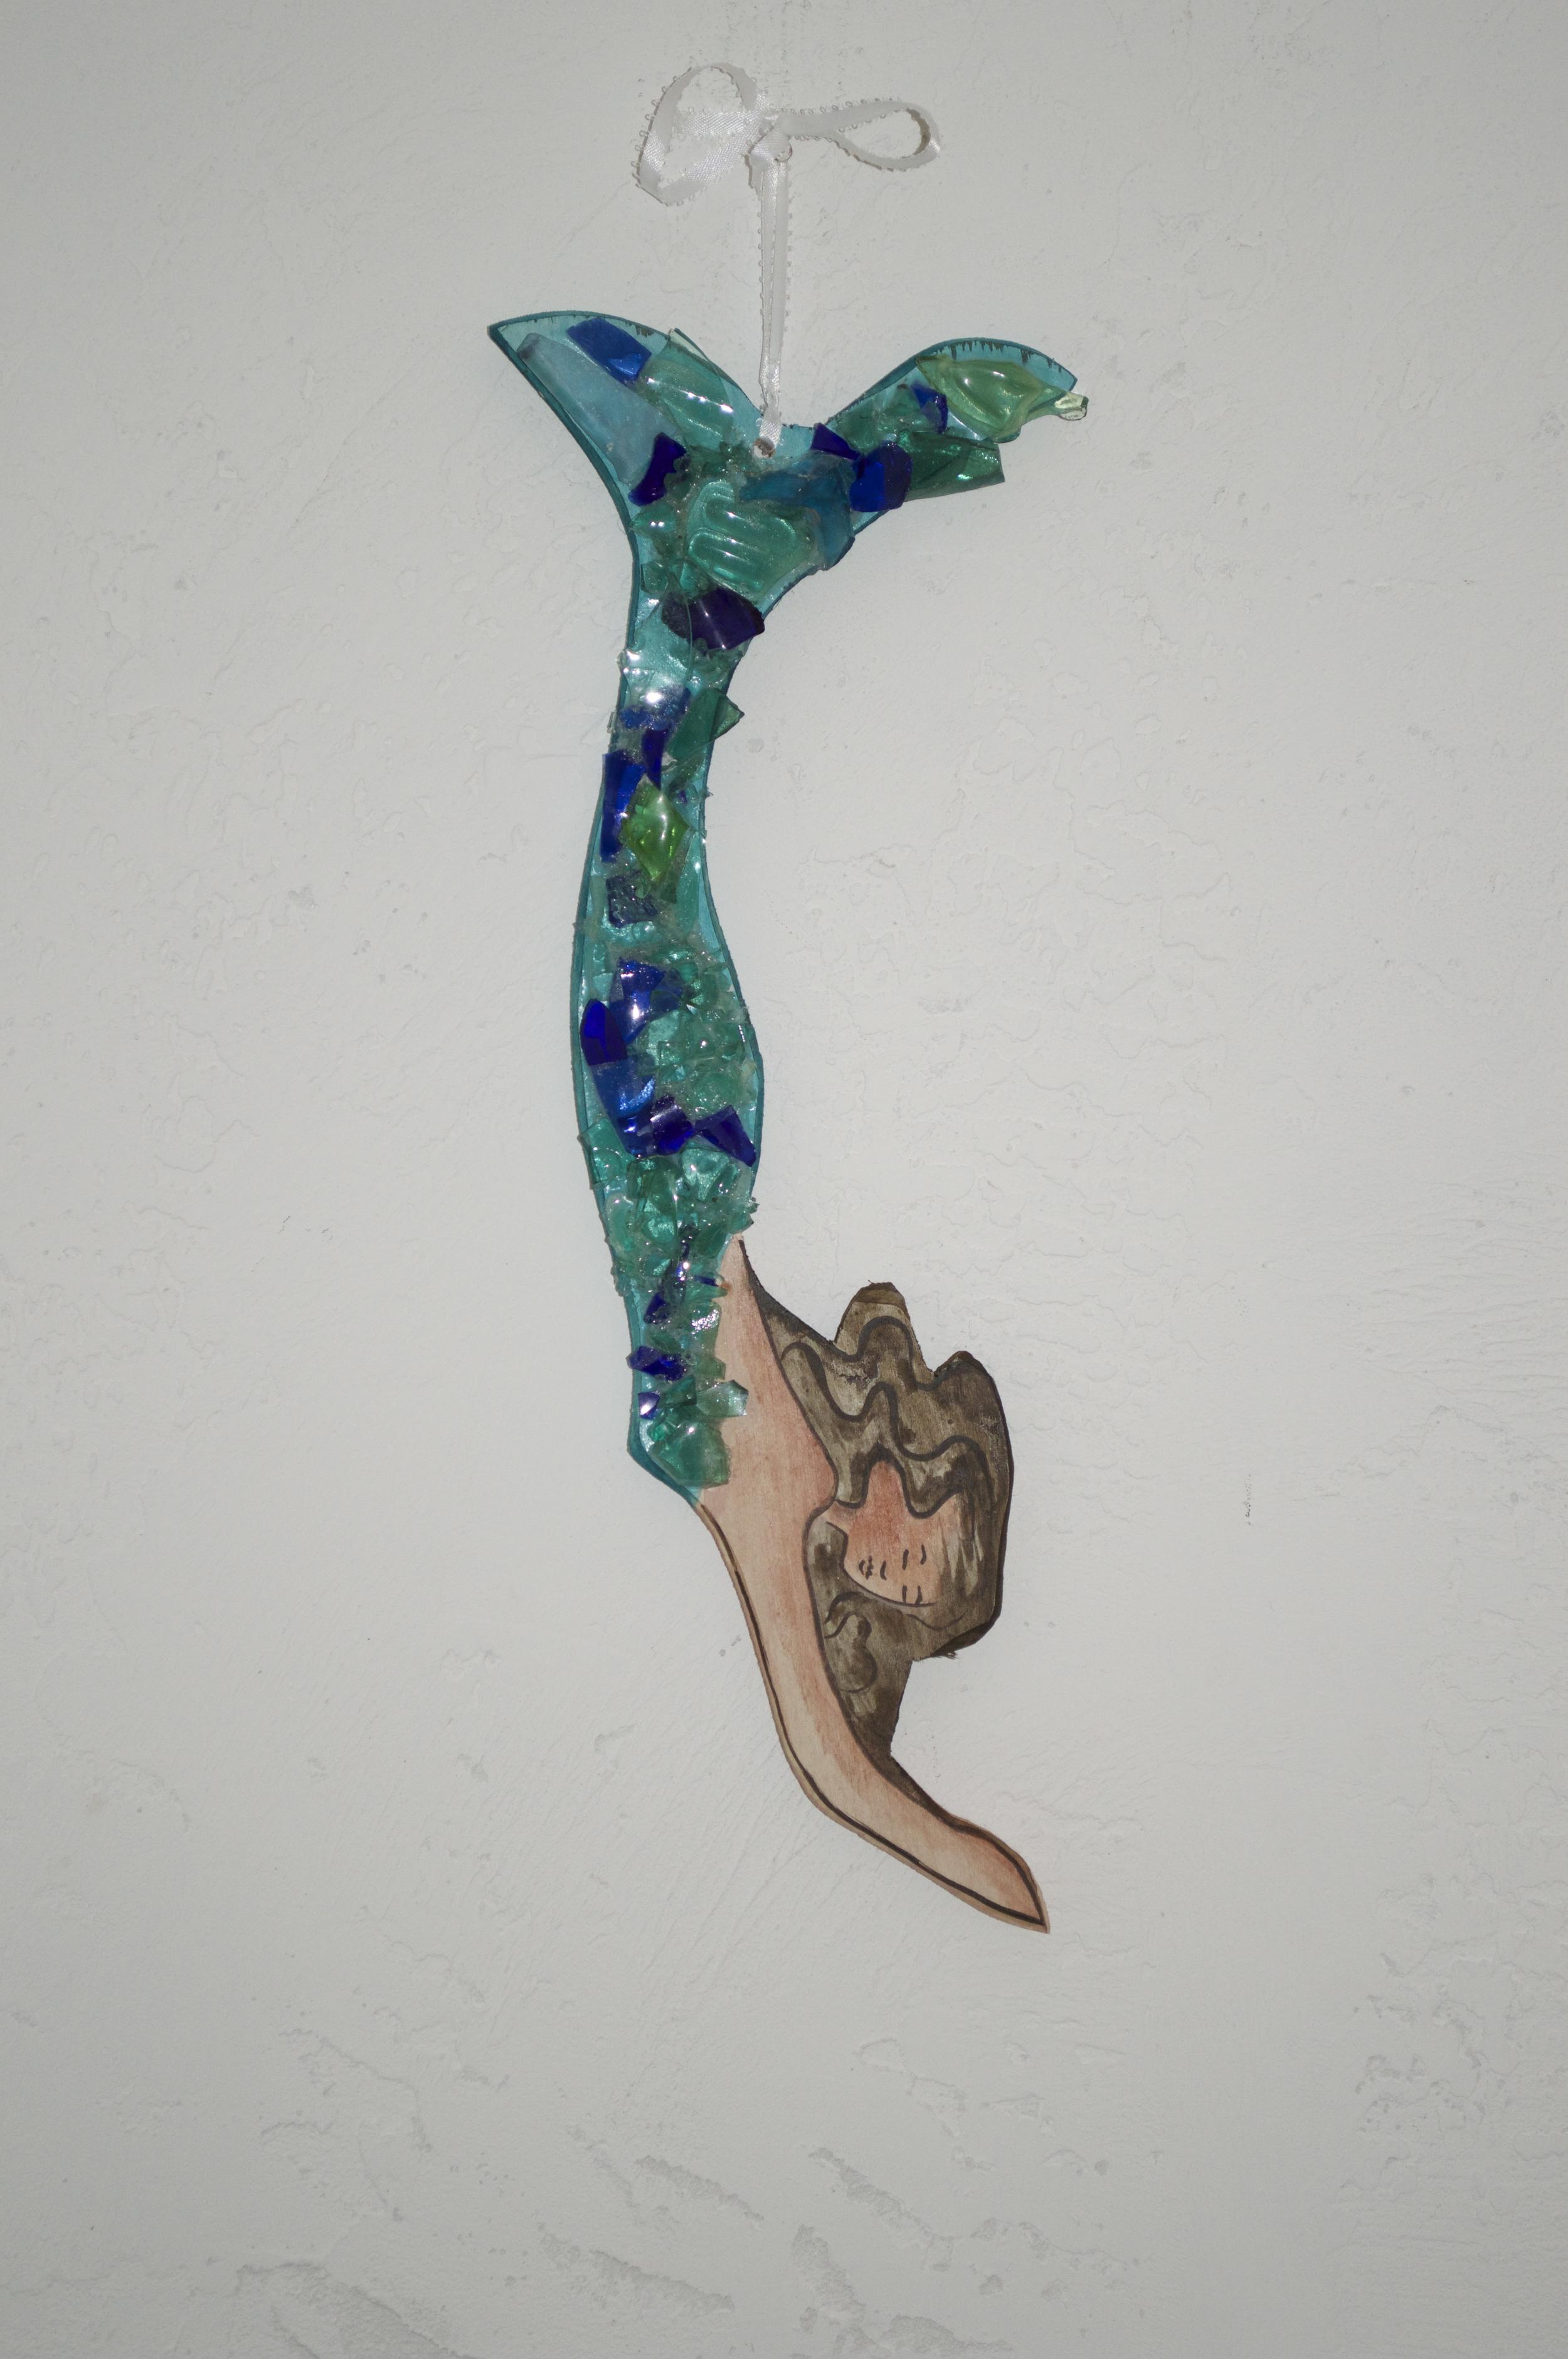 "Beach Art- Diving Mermaid wood,glass - sm. 11"" x 4"", $36, large 17"" x 5"", $45"